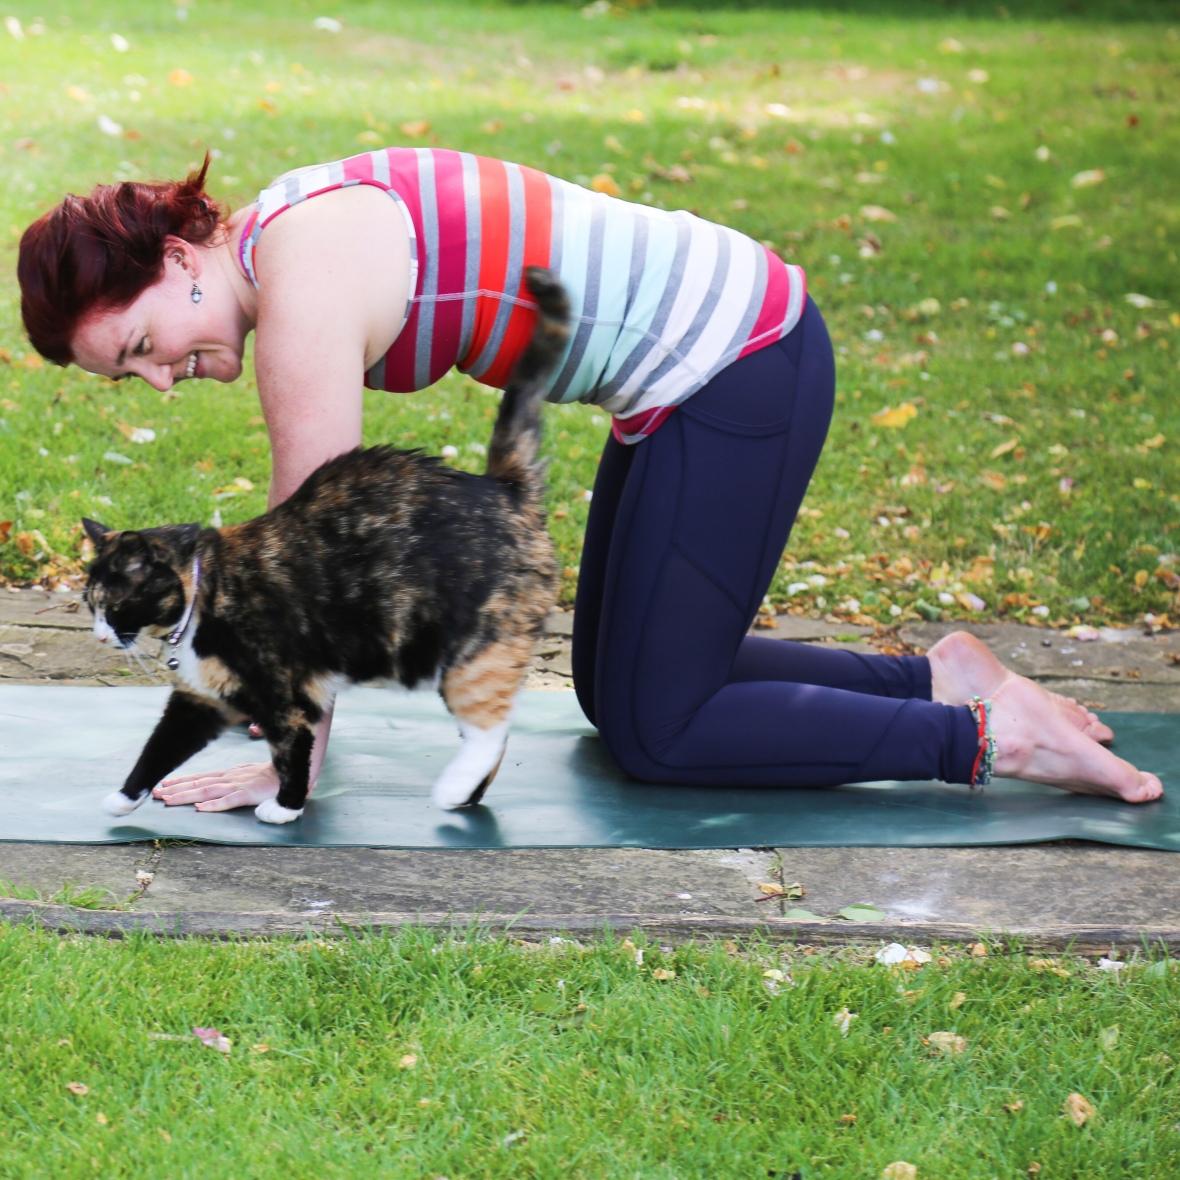 Cat-cow pose, tortoiseshell cat